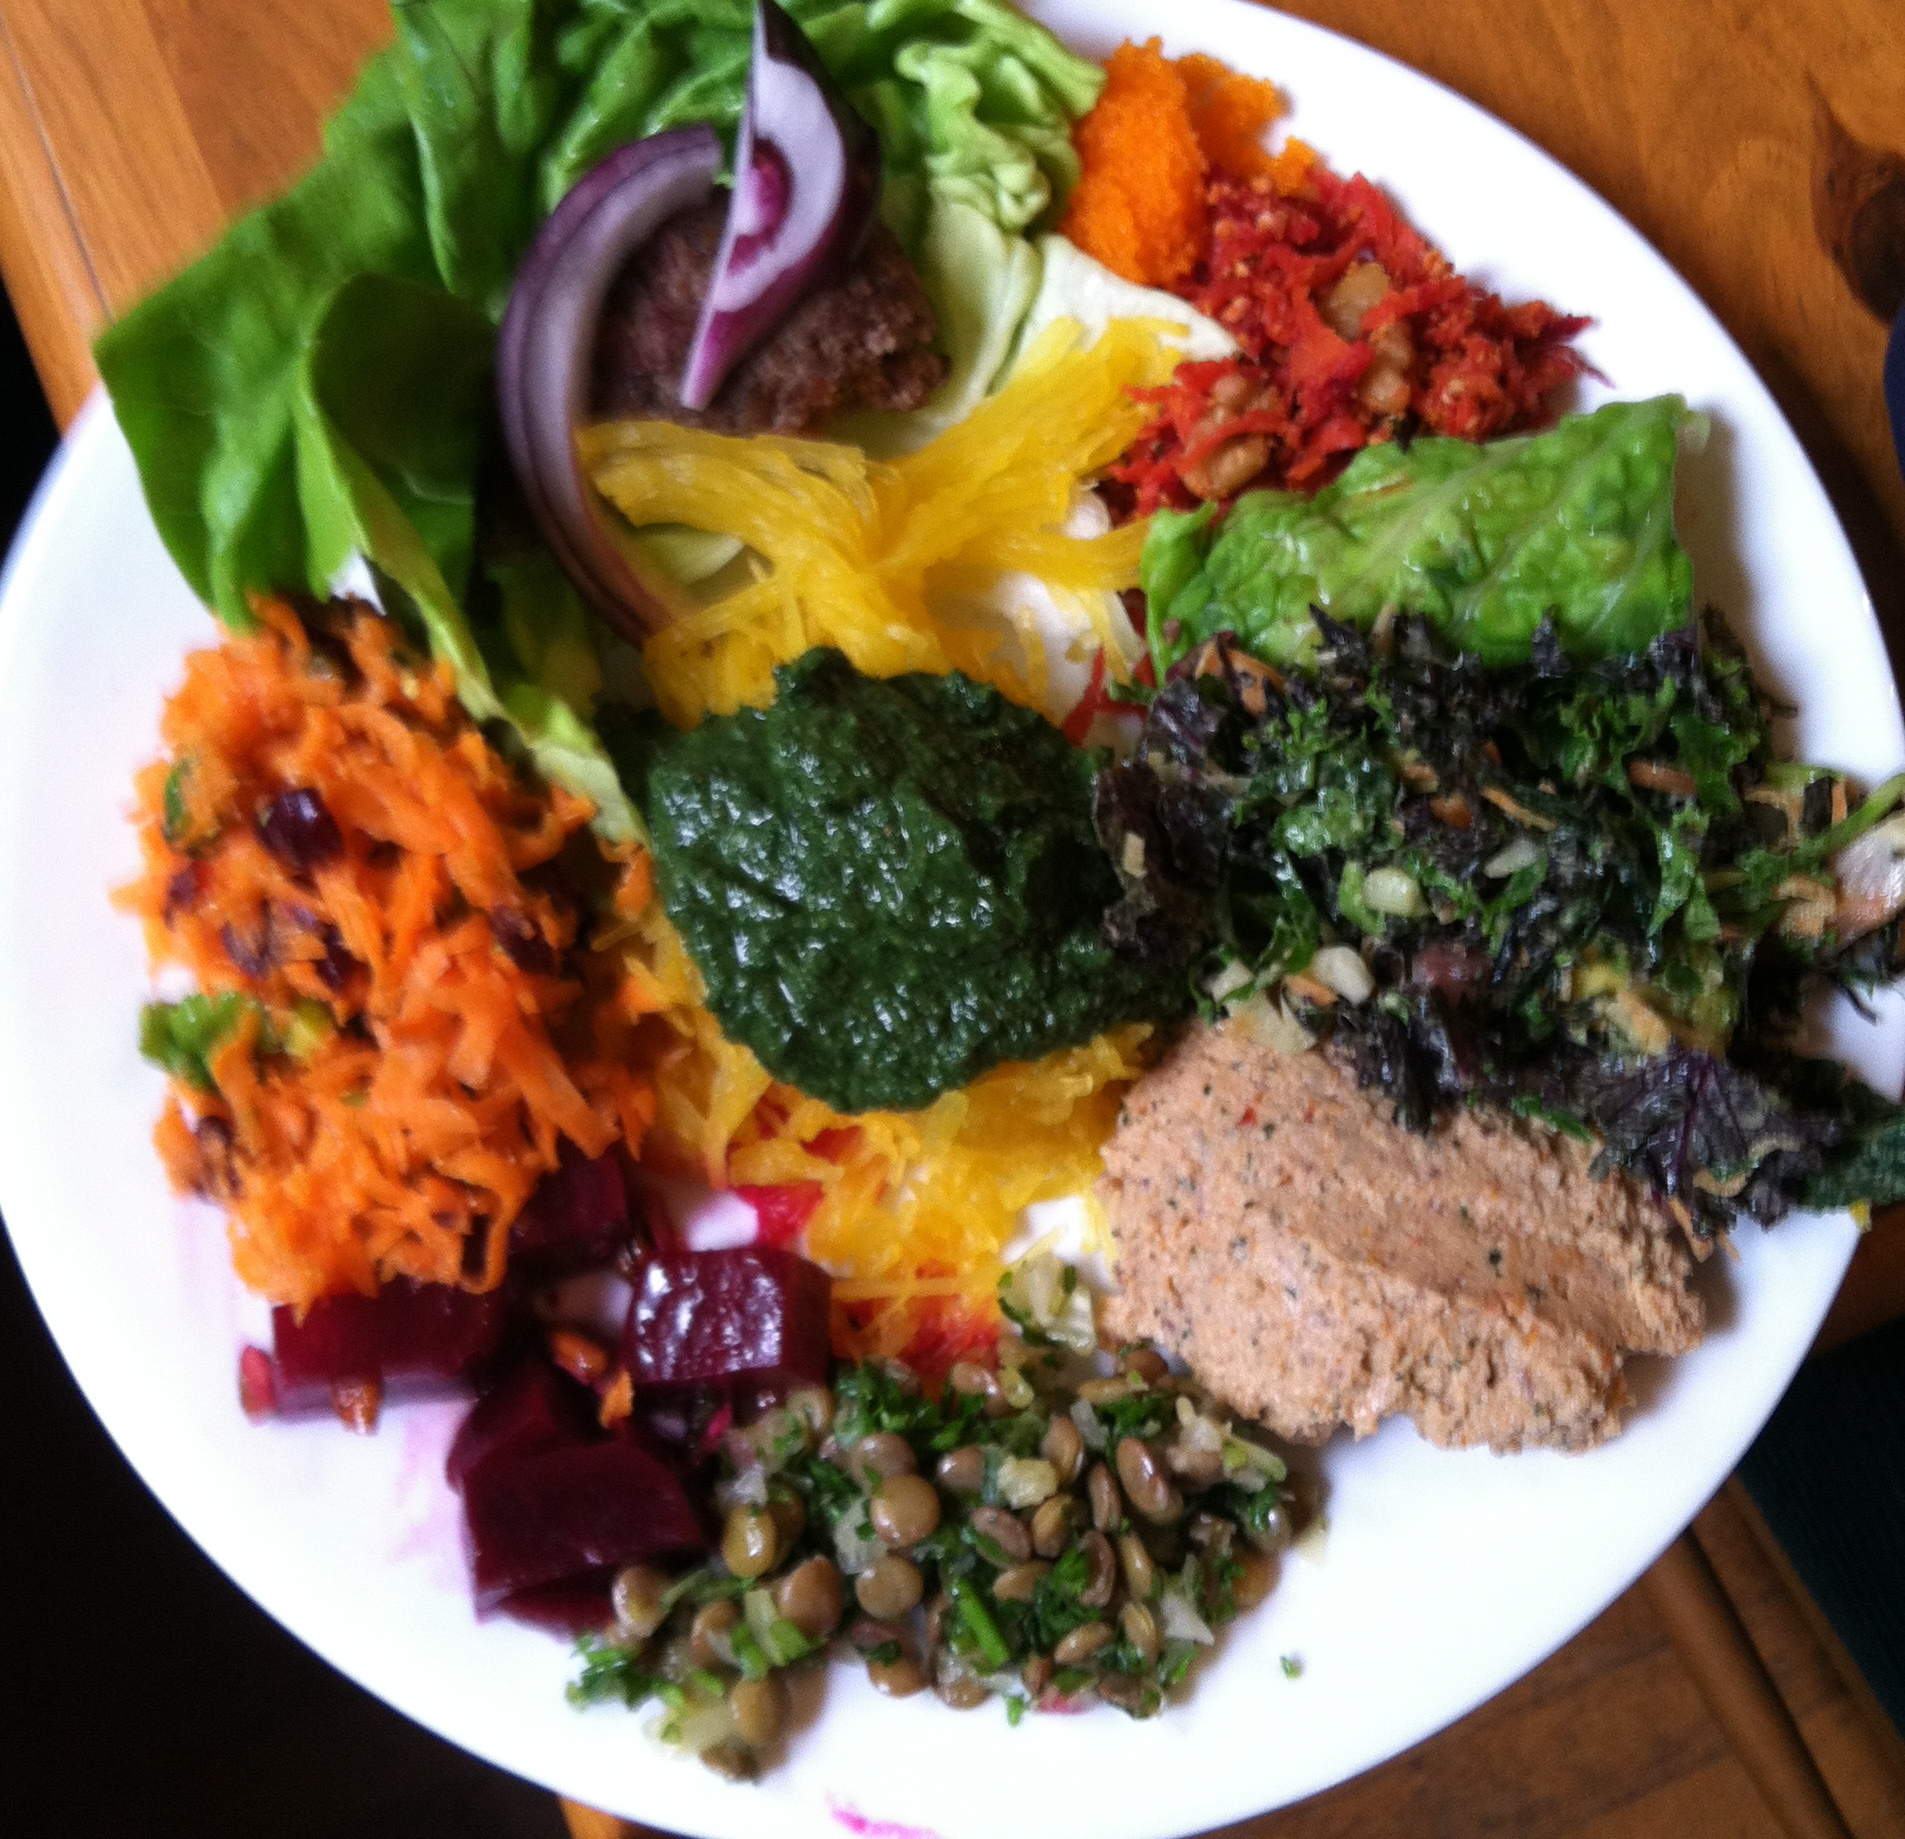 Full Plate Of Food Beautiful Full Plate Food #ypMxS4